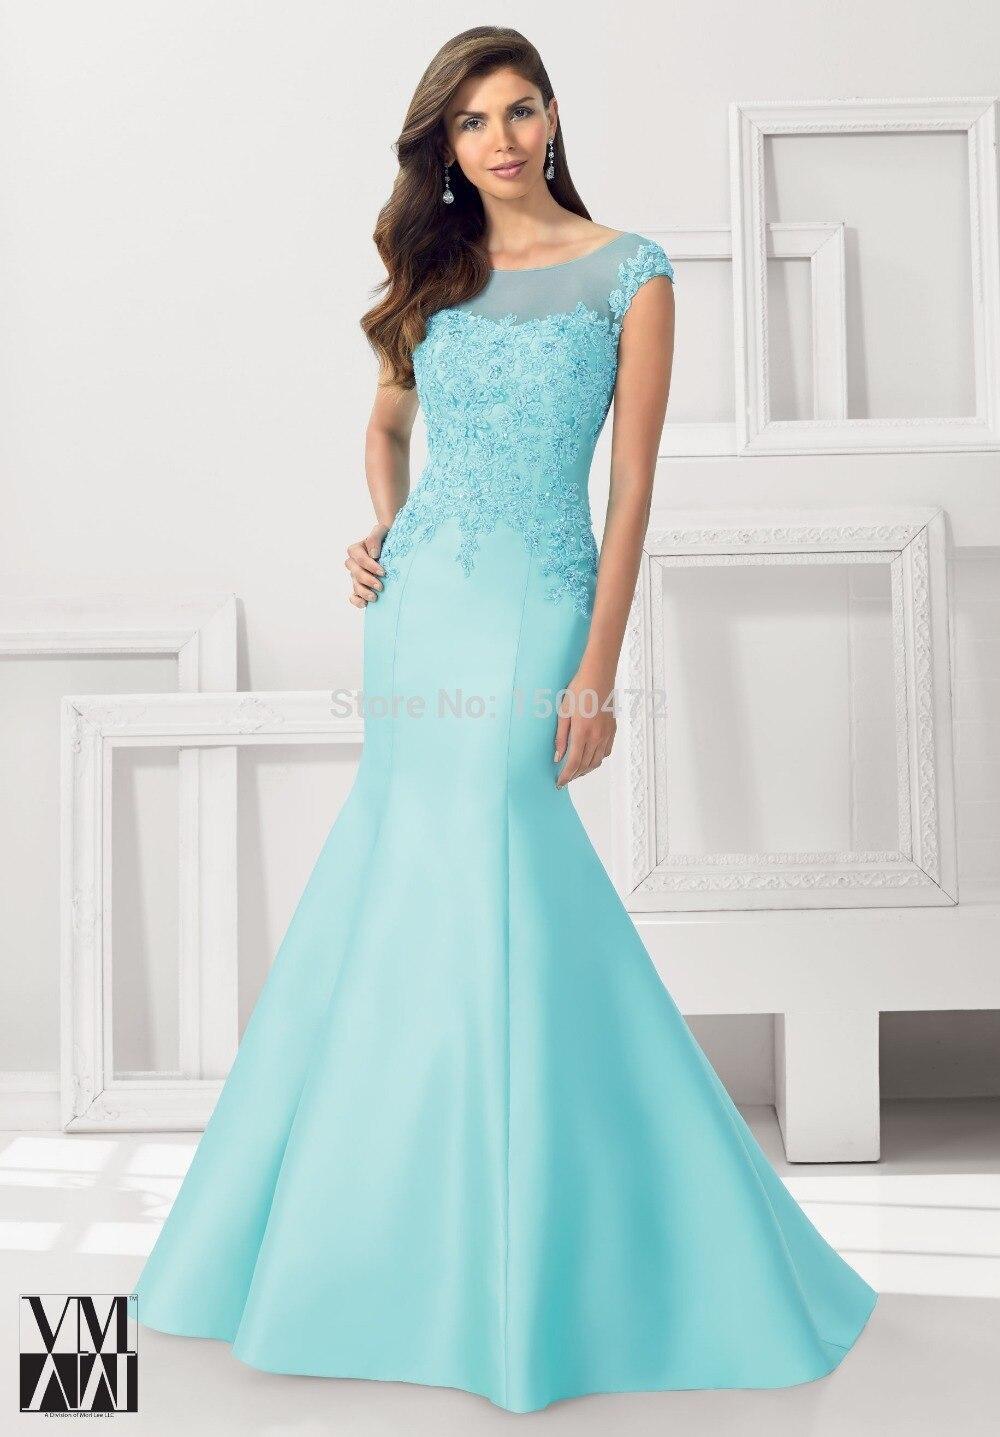 Lovely Vestidos Elegantes Para Madre De La Novia Pictures ...